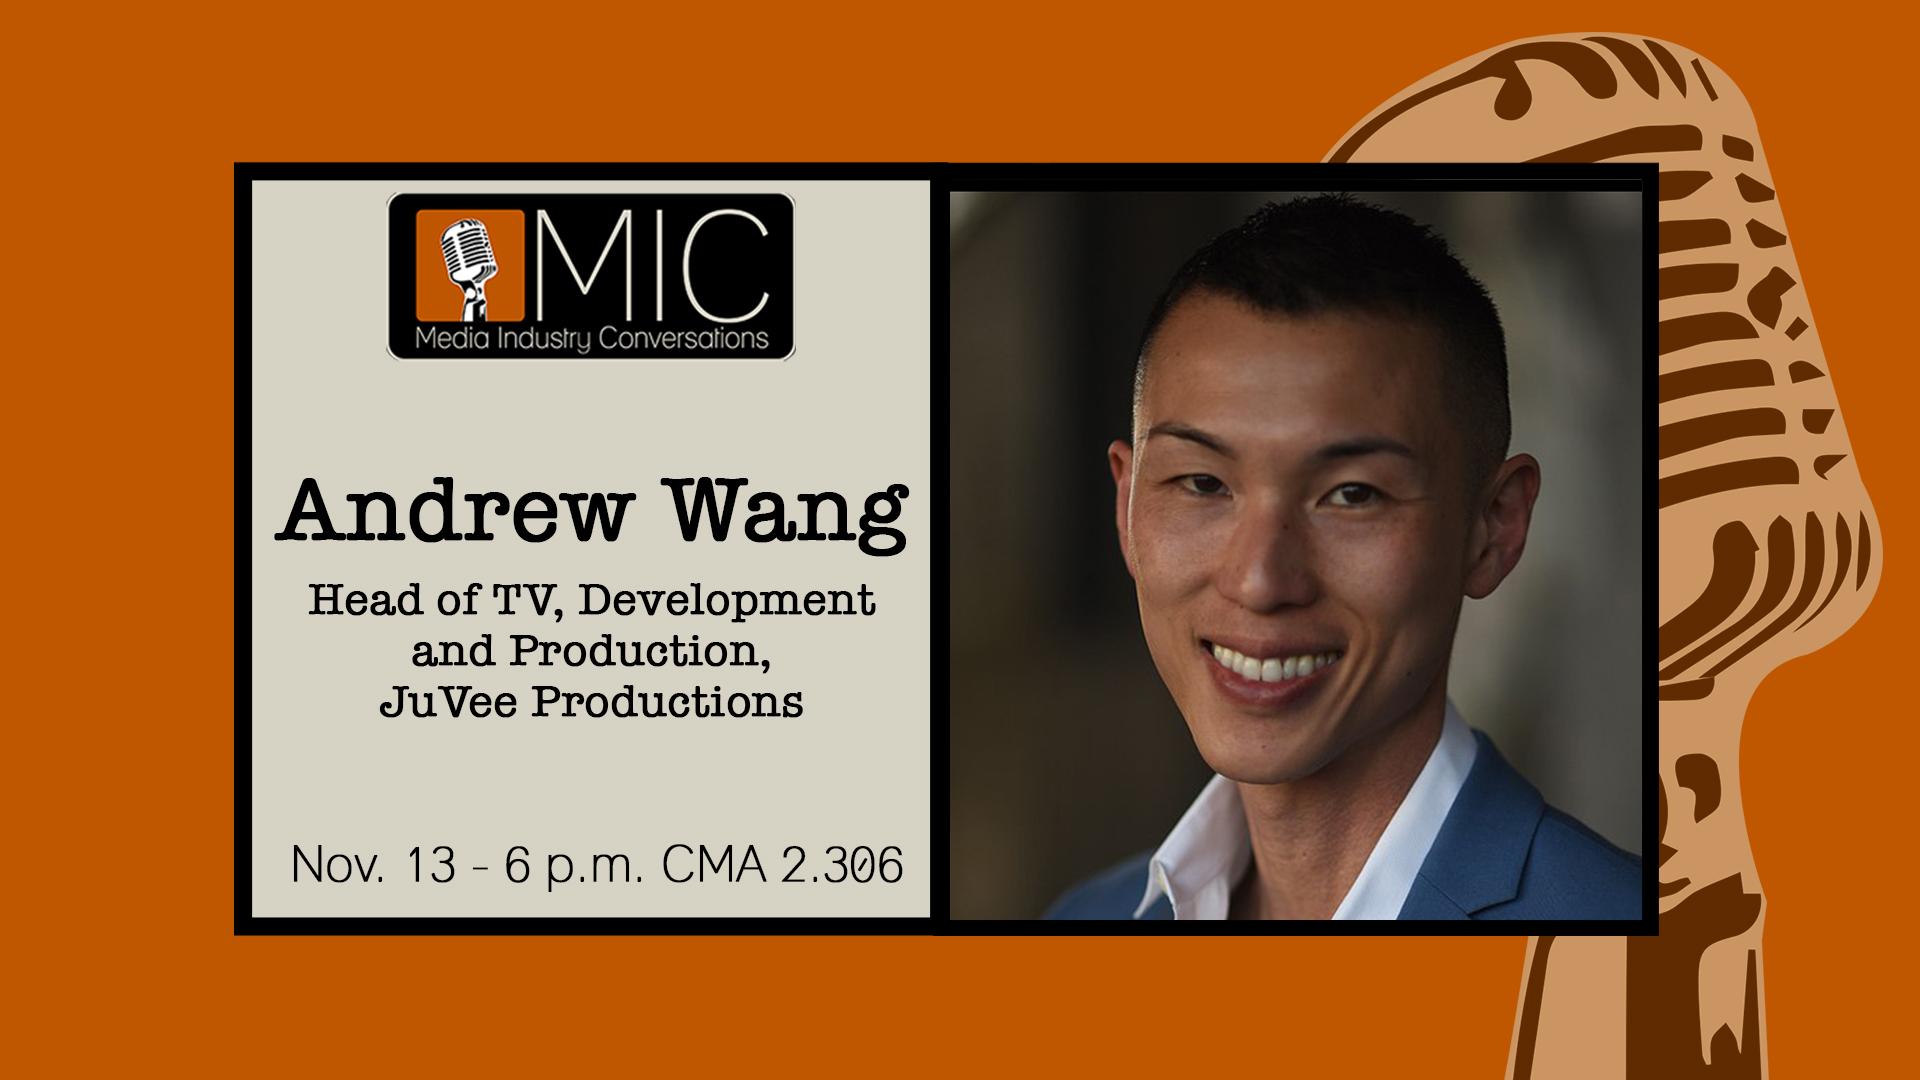 Andrew Wang nov 13